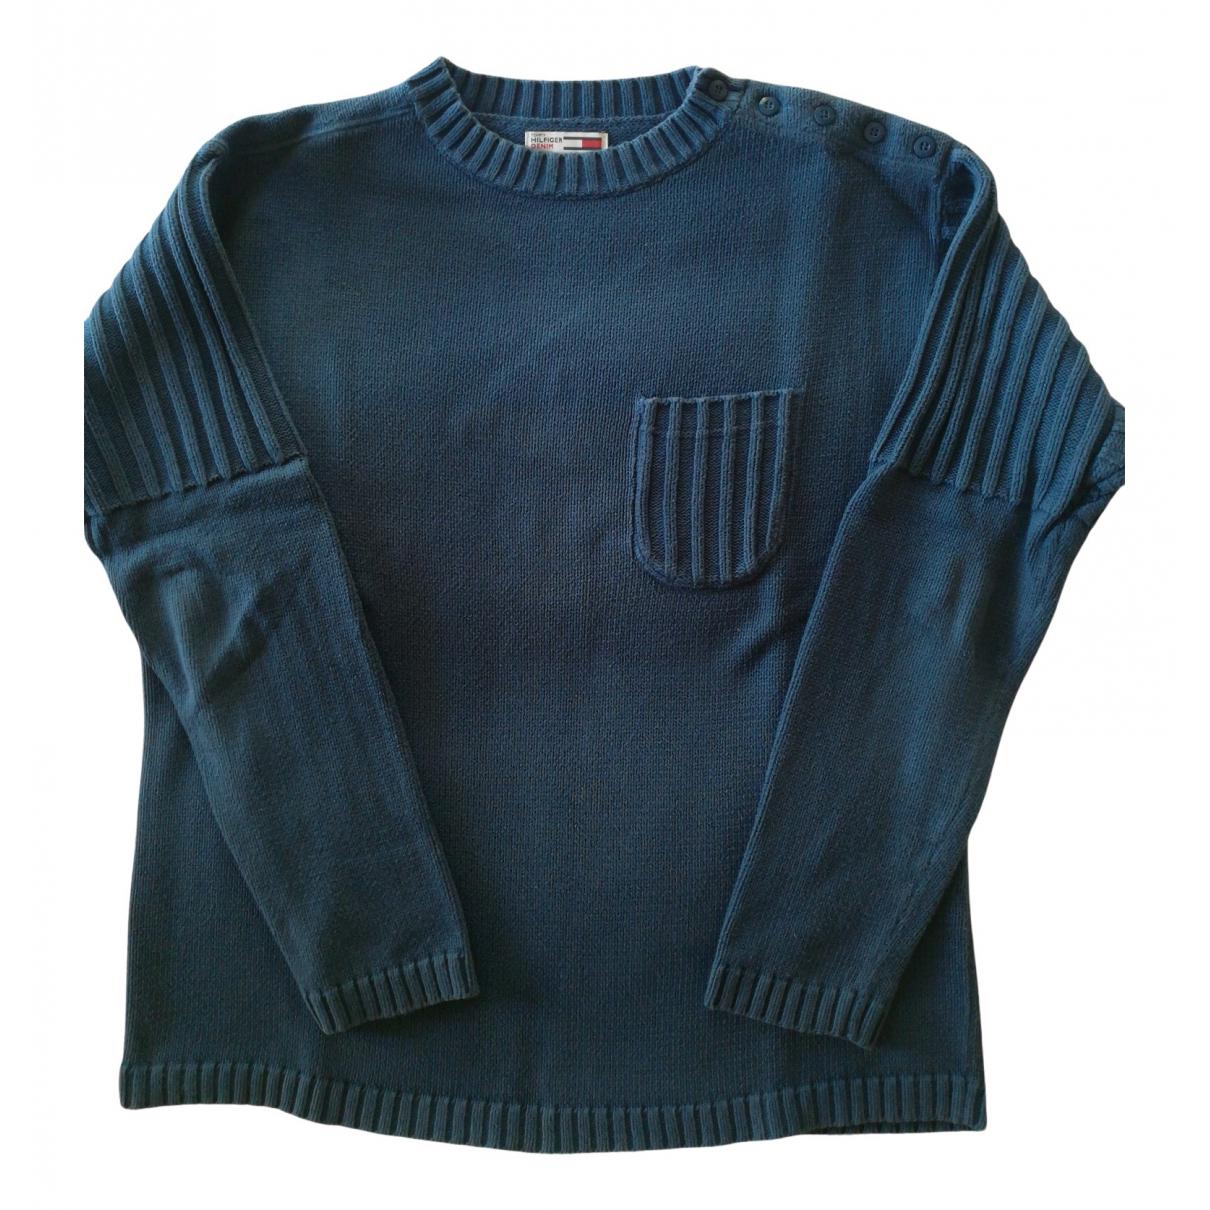 Tommy Hilfiger N Blue Cotton Knitwear & Sweatshirts for Men M International